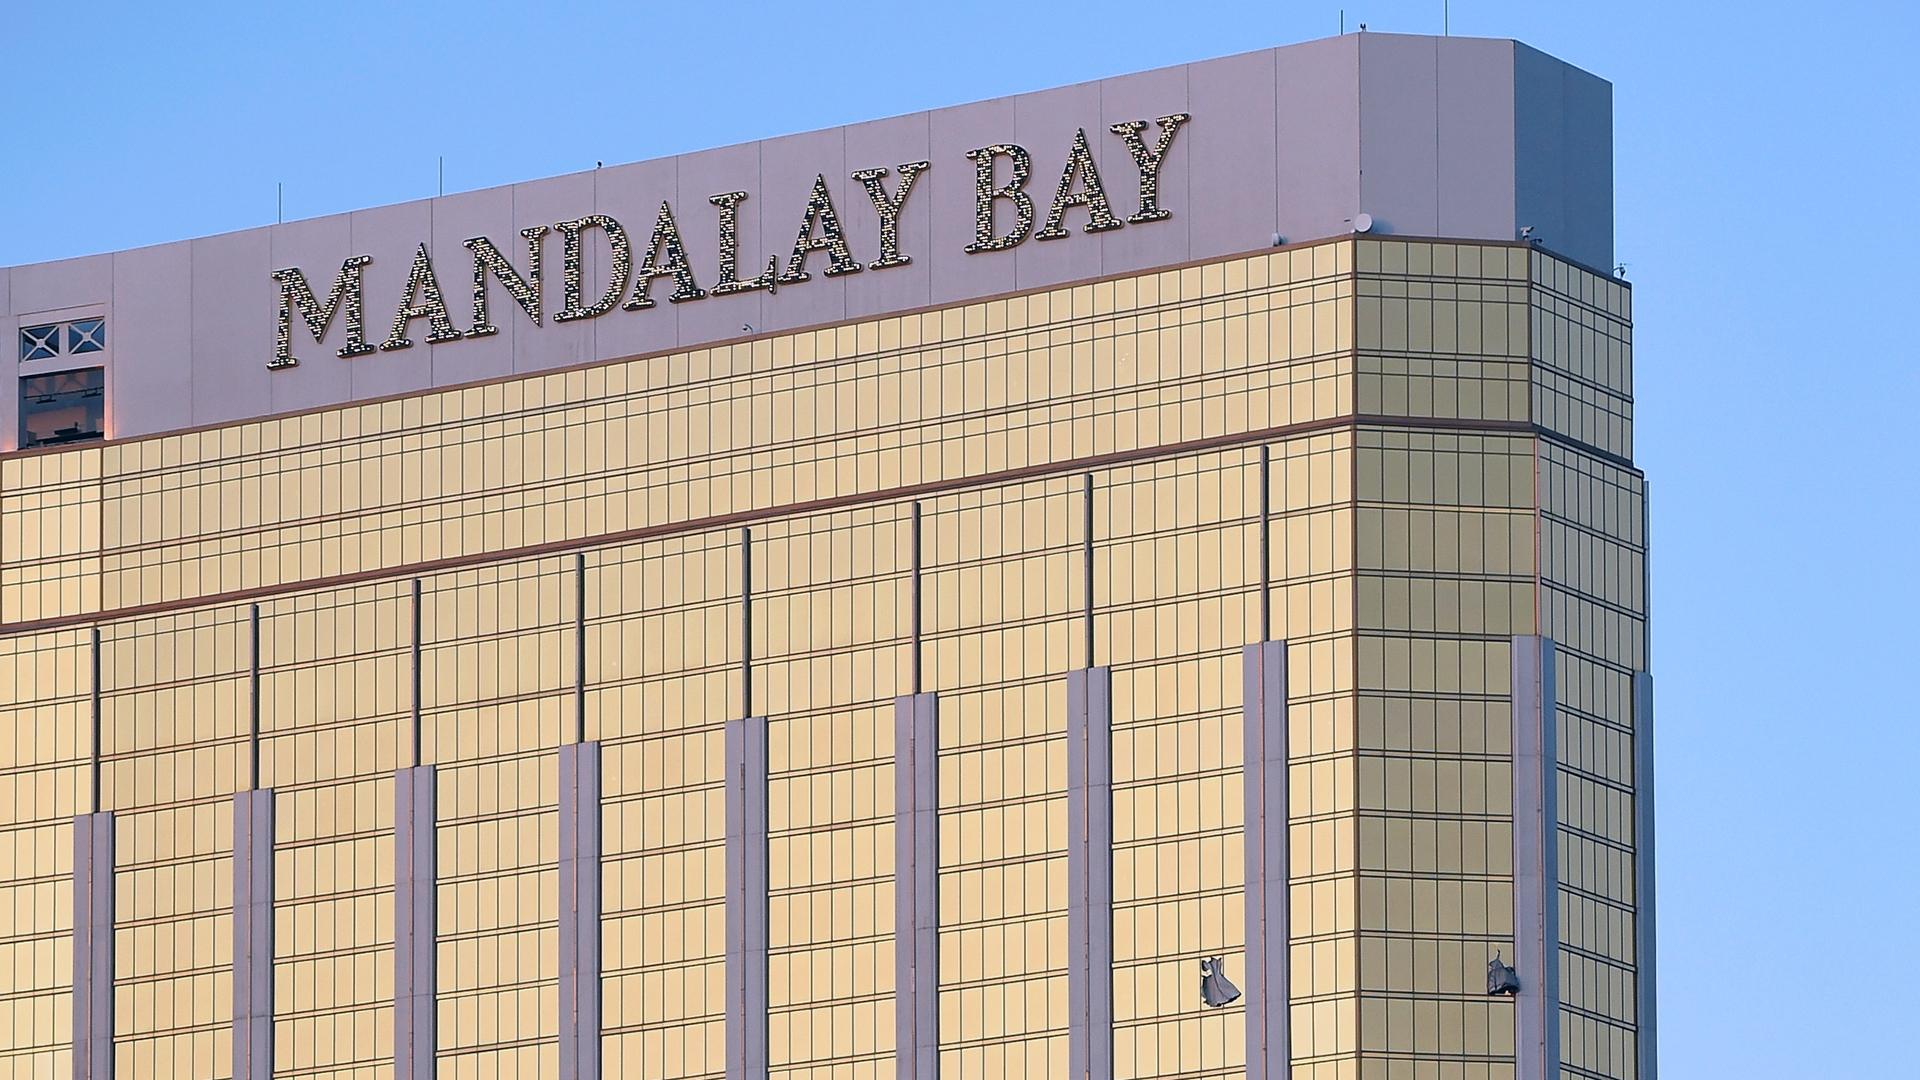 Las Vegas Mass Shooting broken windows at Mandalay Bay-159532.jpg13247784